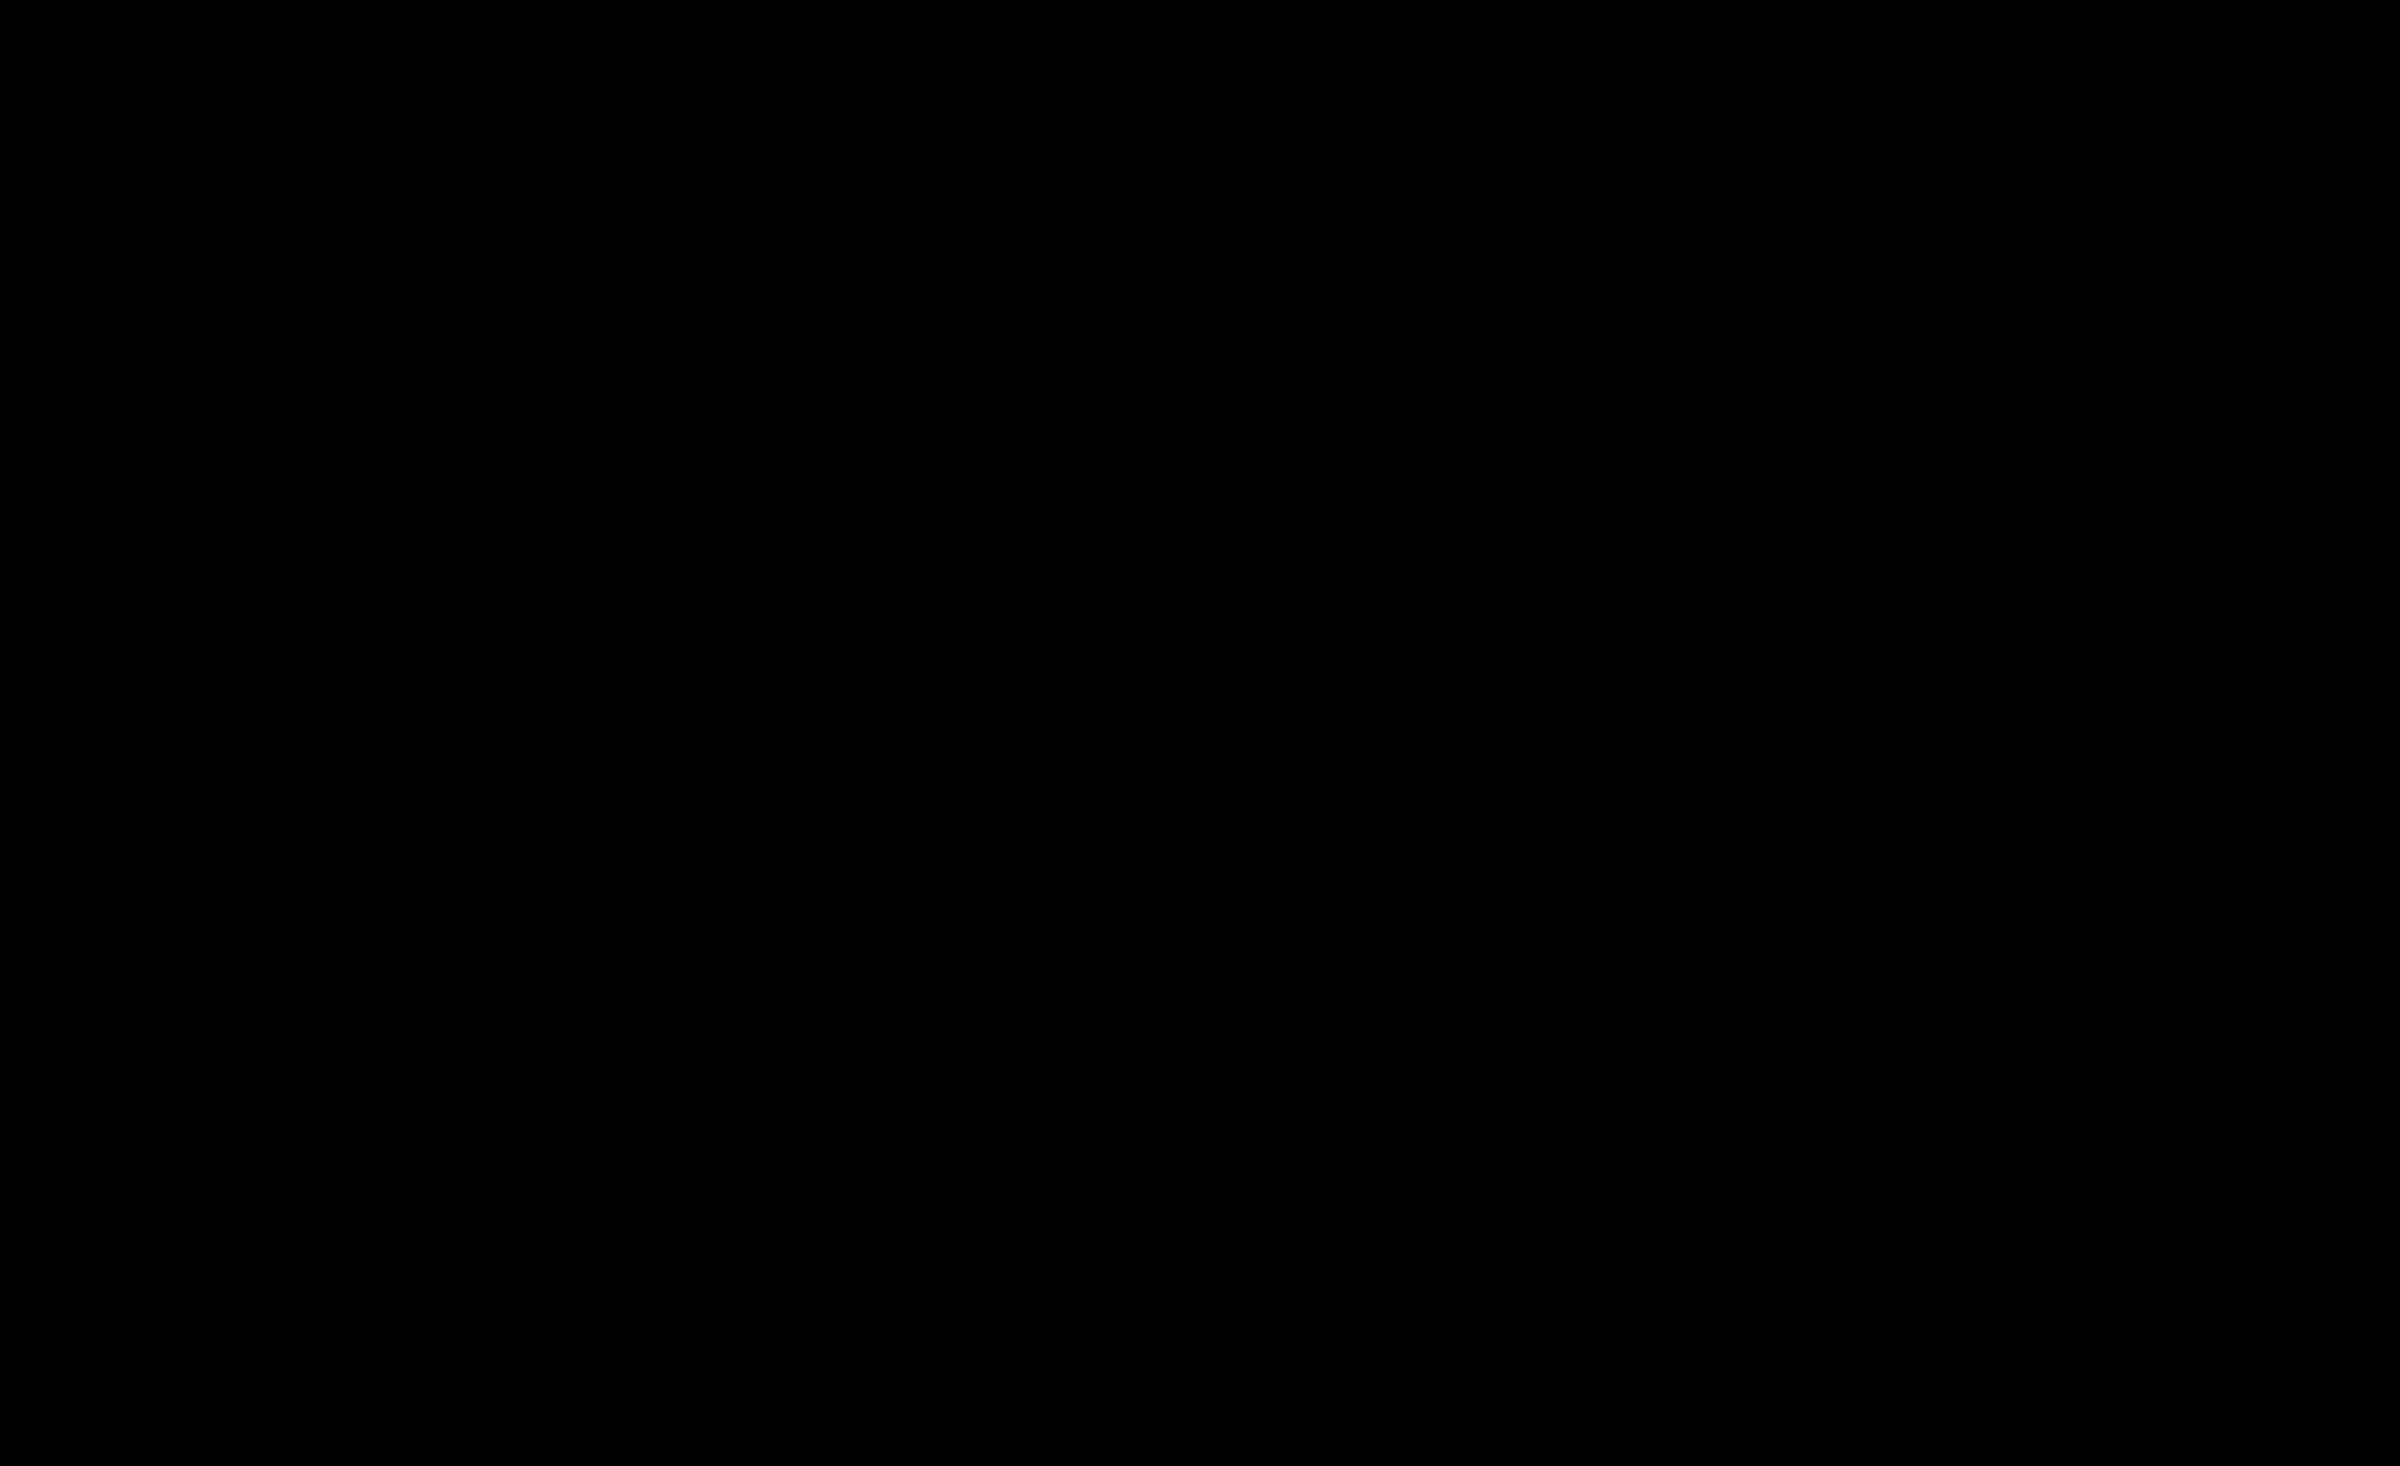 2400x1466 Clipart